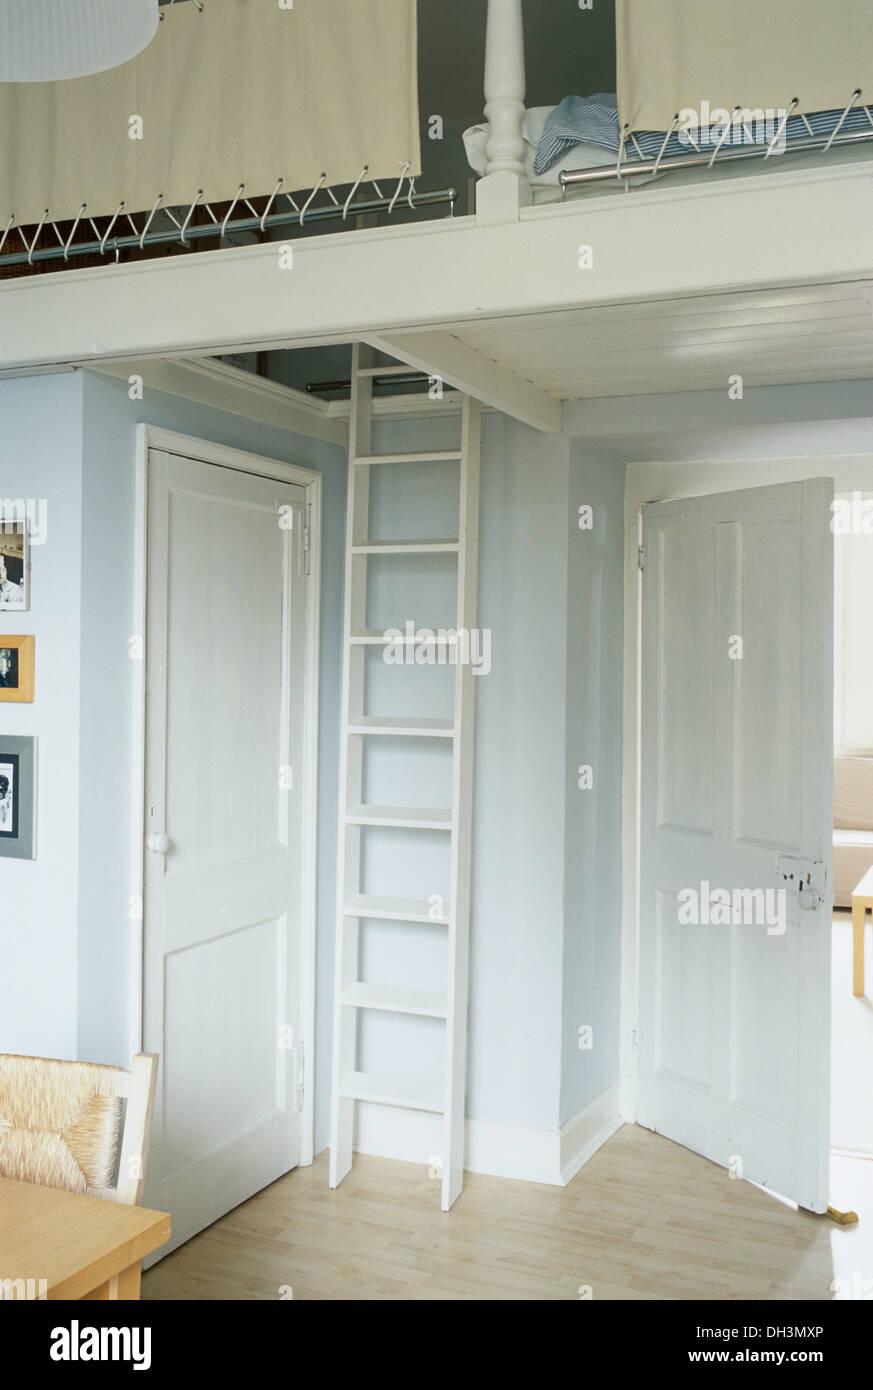 Studio apartment with ladder to bedroom on mezzanine floor for How to build a mezzanine floor for bedroom